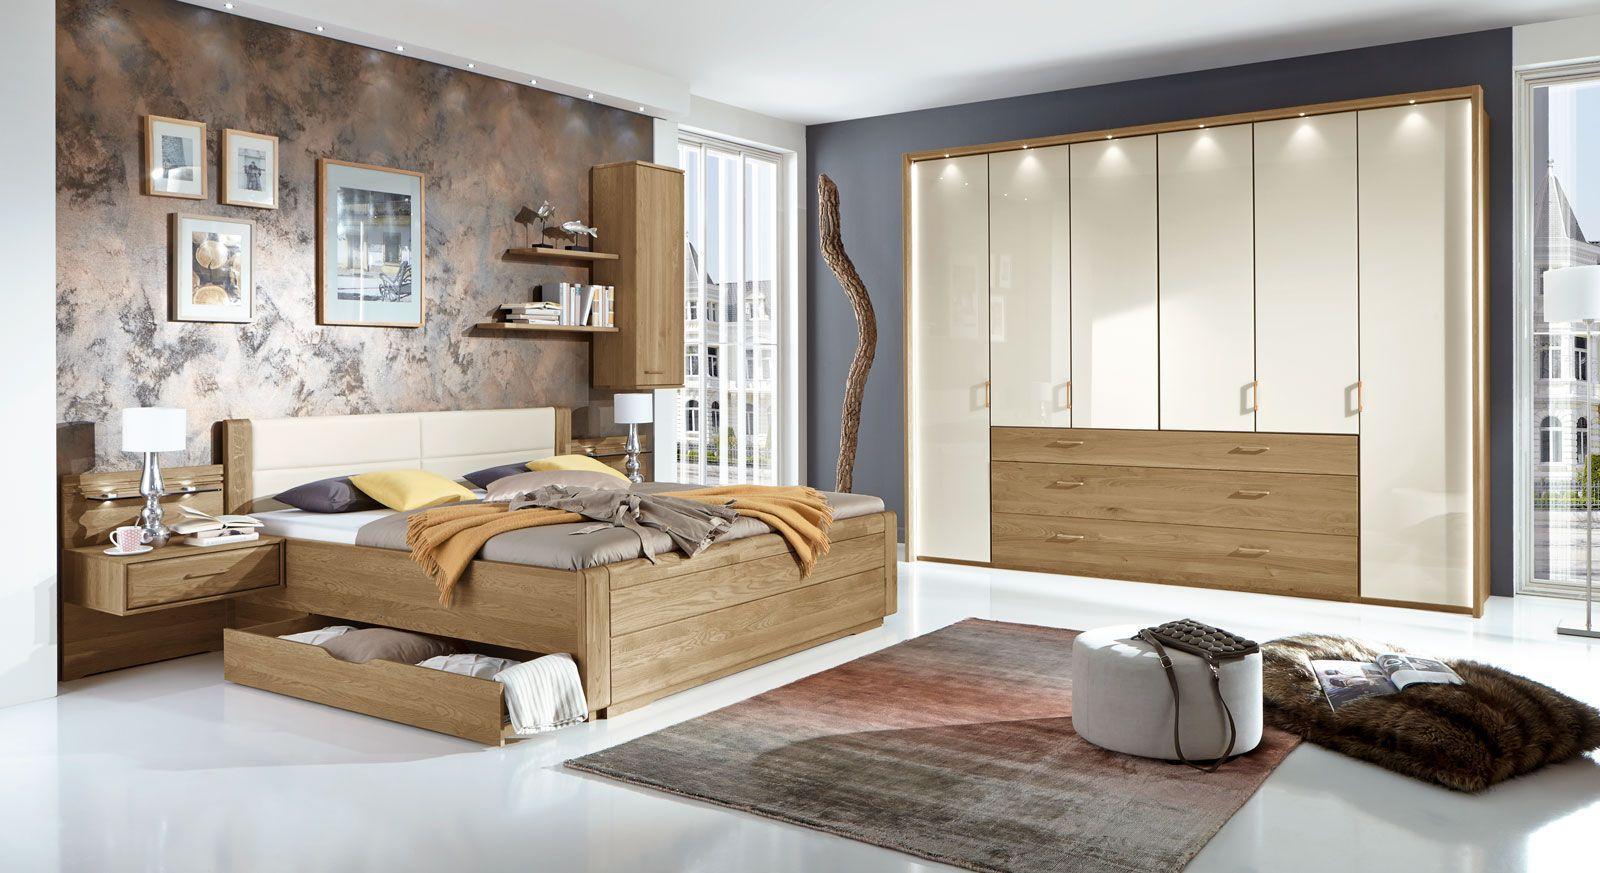 Schlafzimmer Komplett Günstig